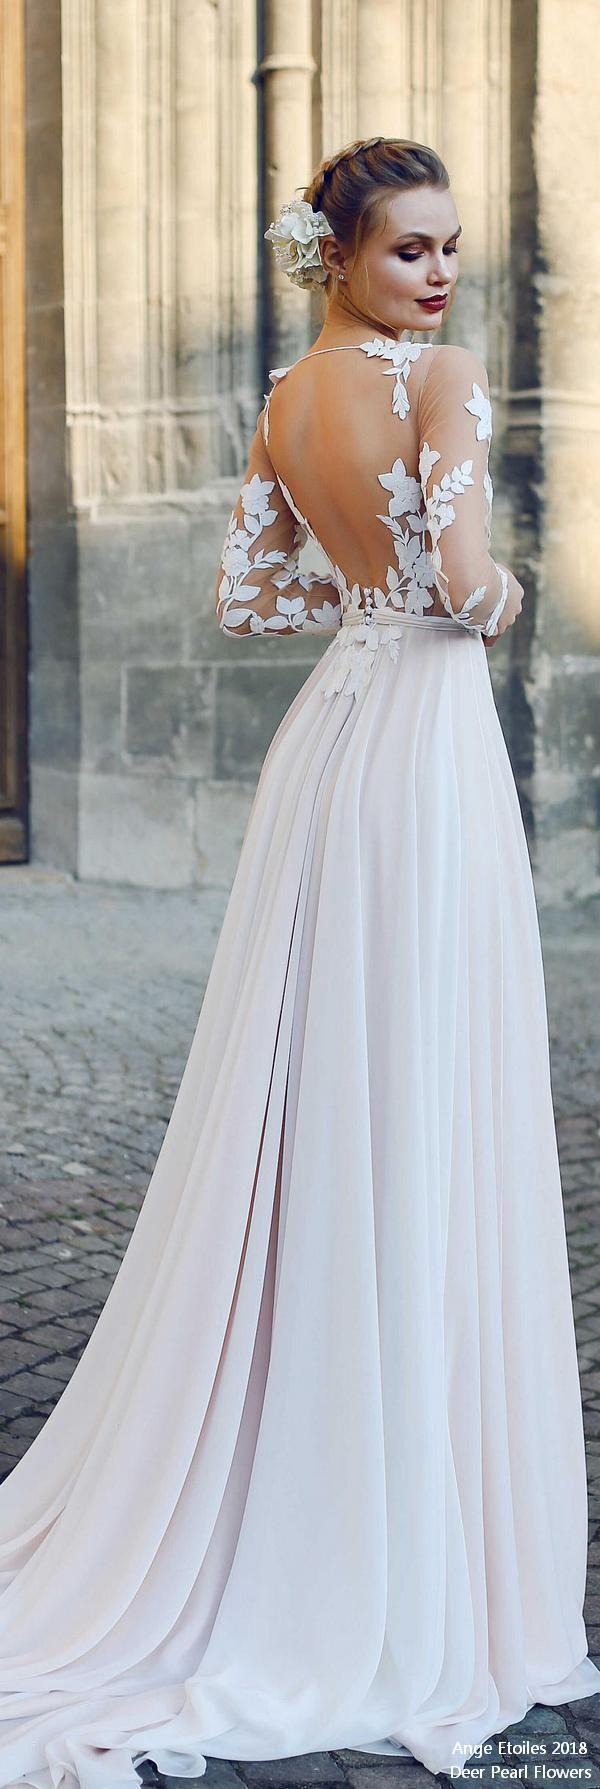 Hayley paige dori wedding dress  Etsy Finds Ange Etoiles Wedding Dresses   Vintage weddings